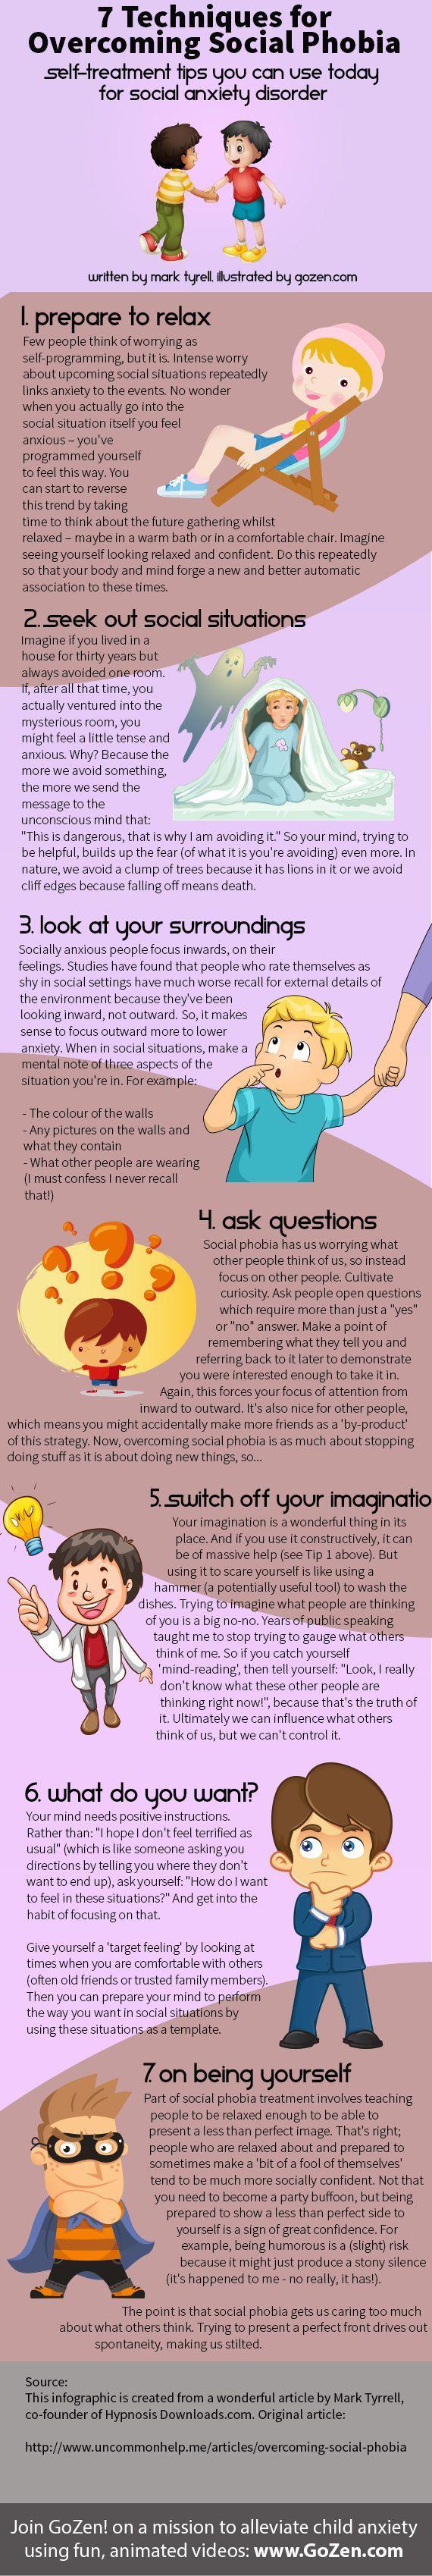 7 Techniques for Overcoming Social Phobia | GoZen!